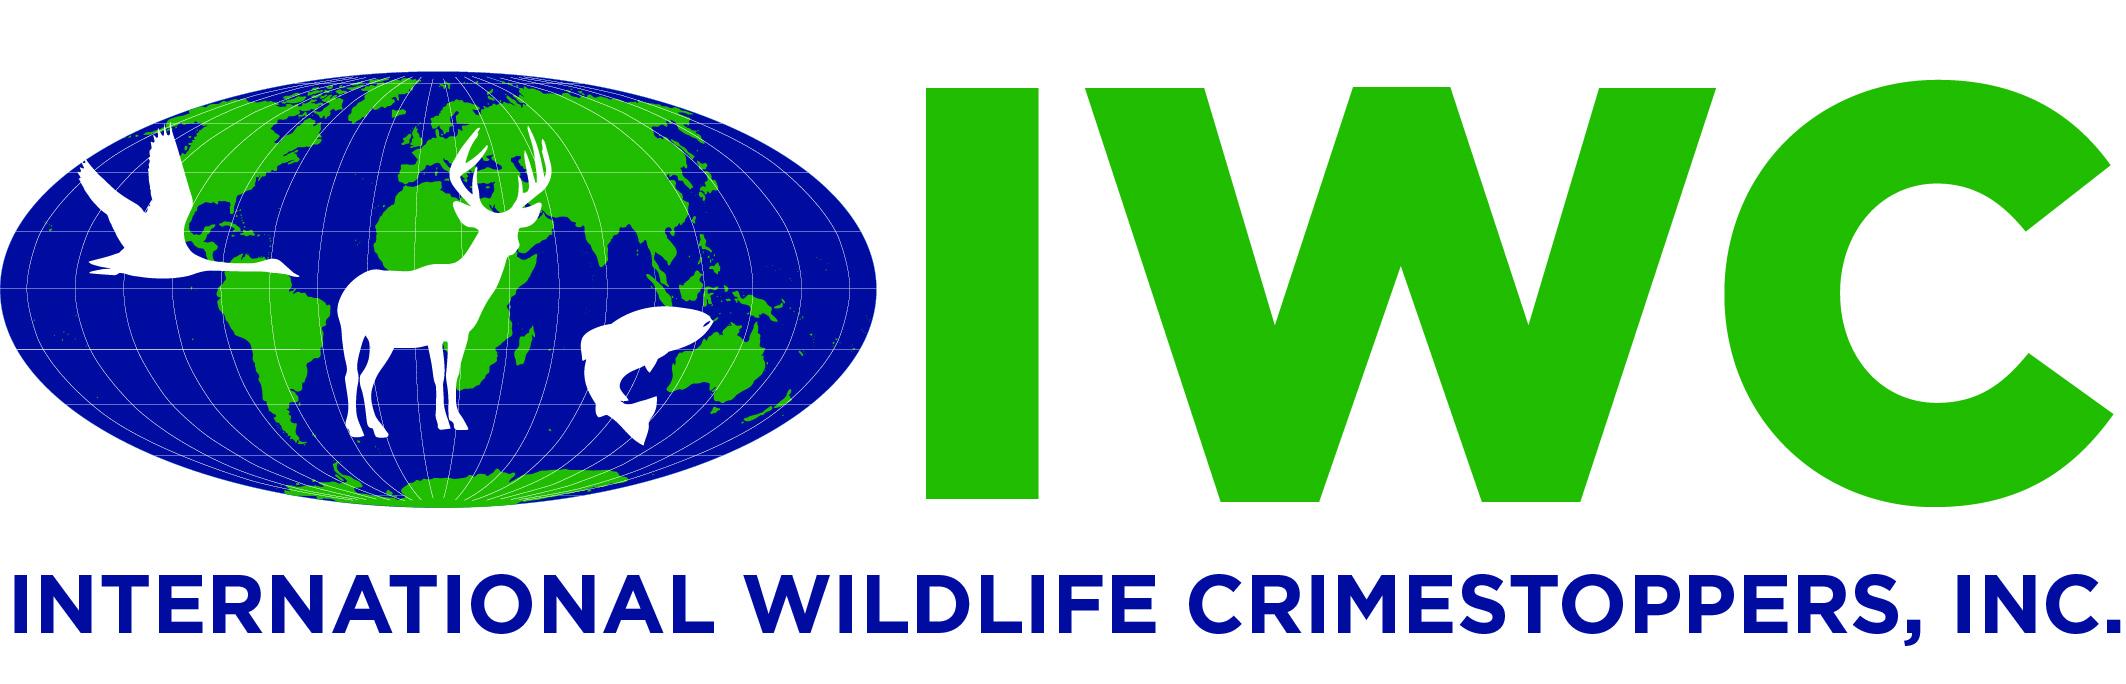 International Wildlife Crimestoppers